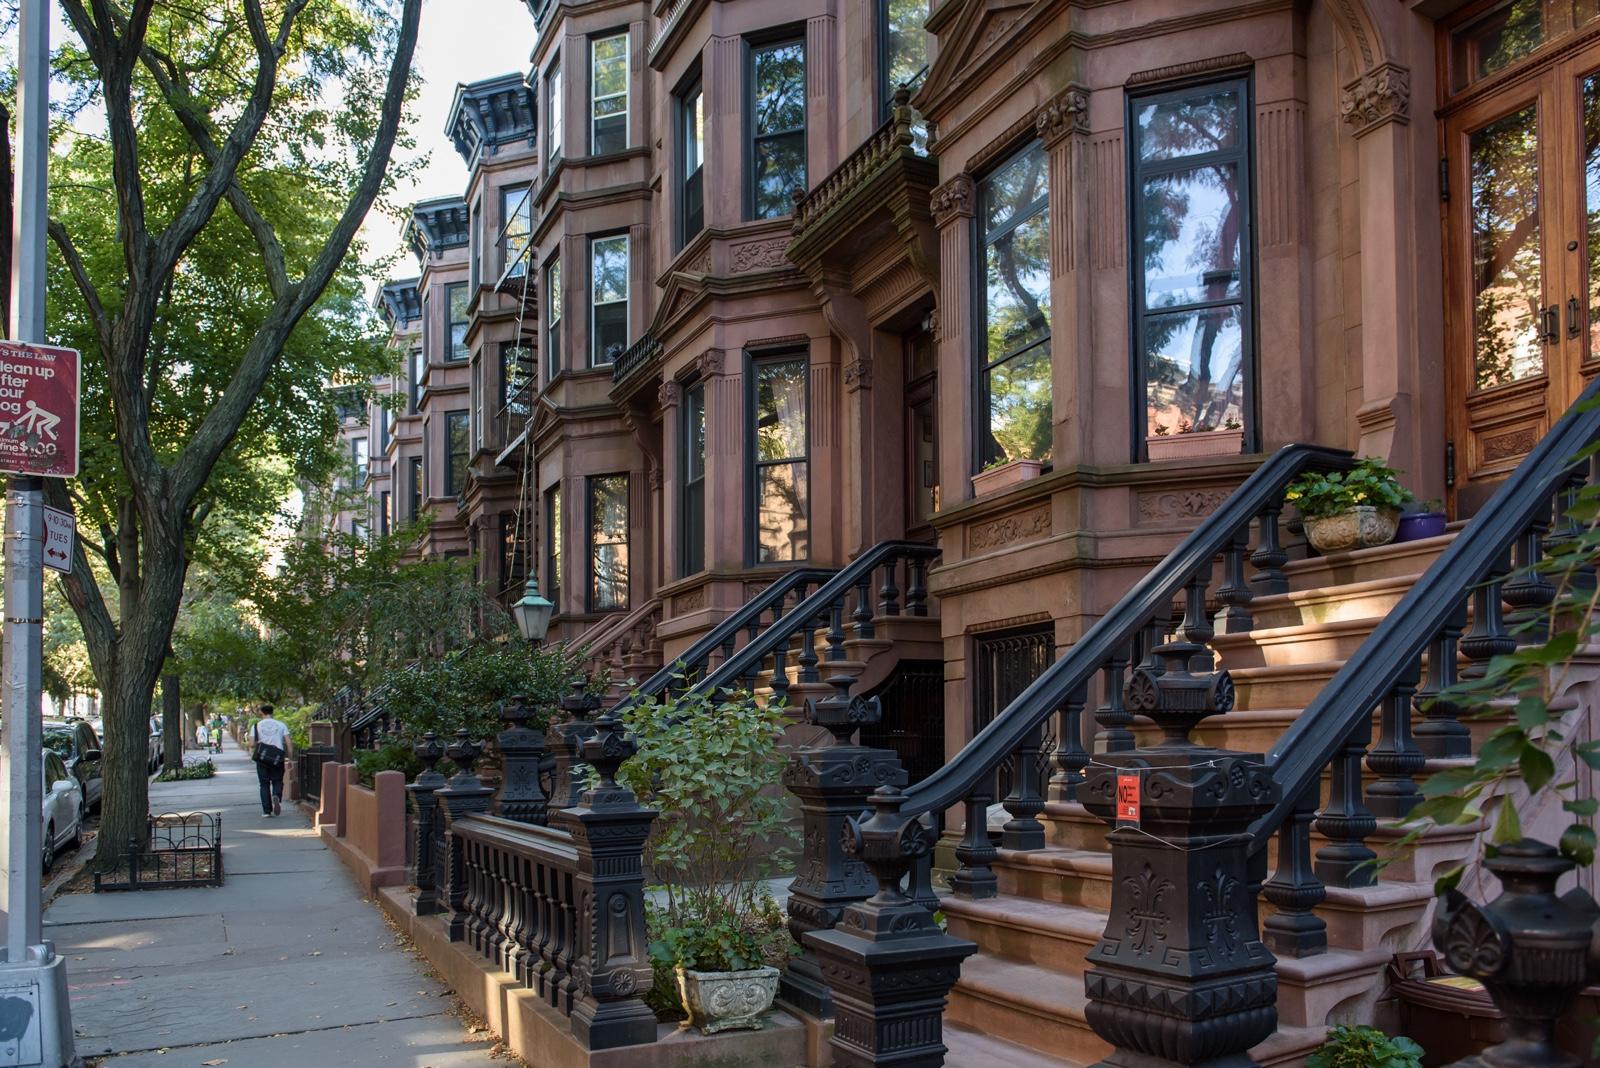 Park Slope Affordable Housing 851d6d Jpg